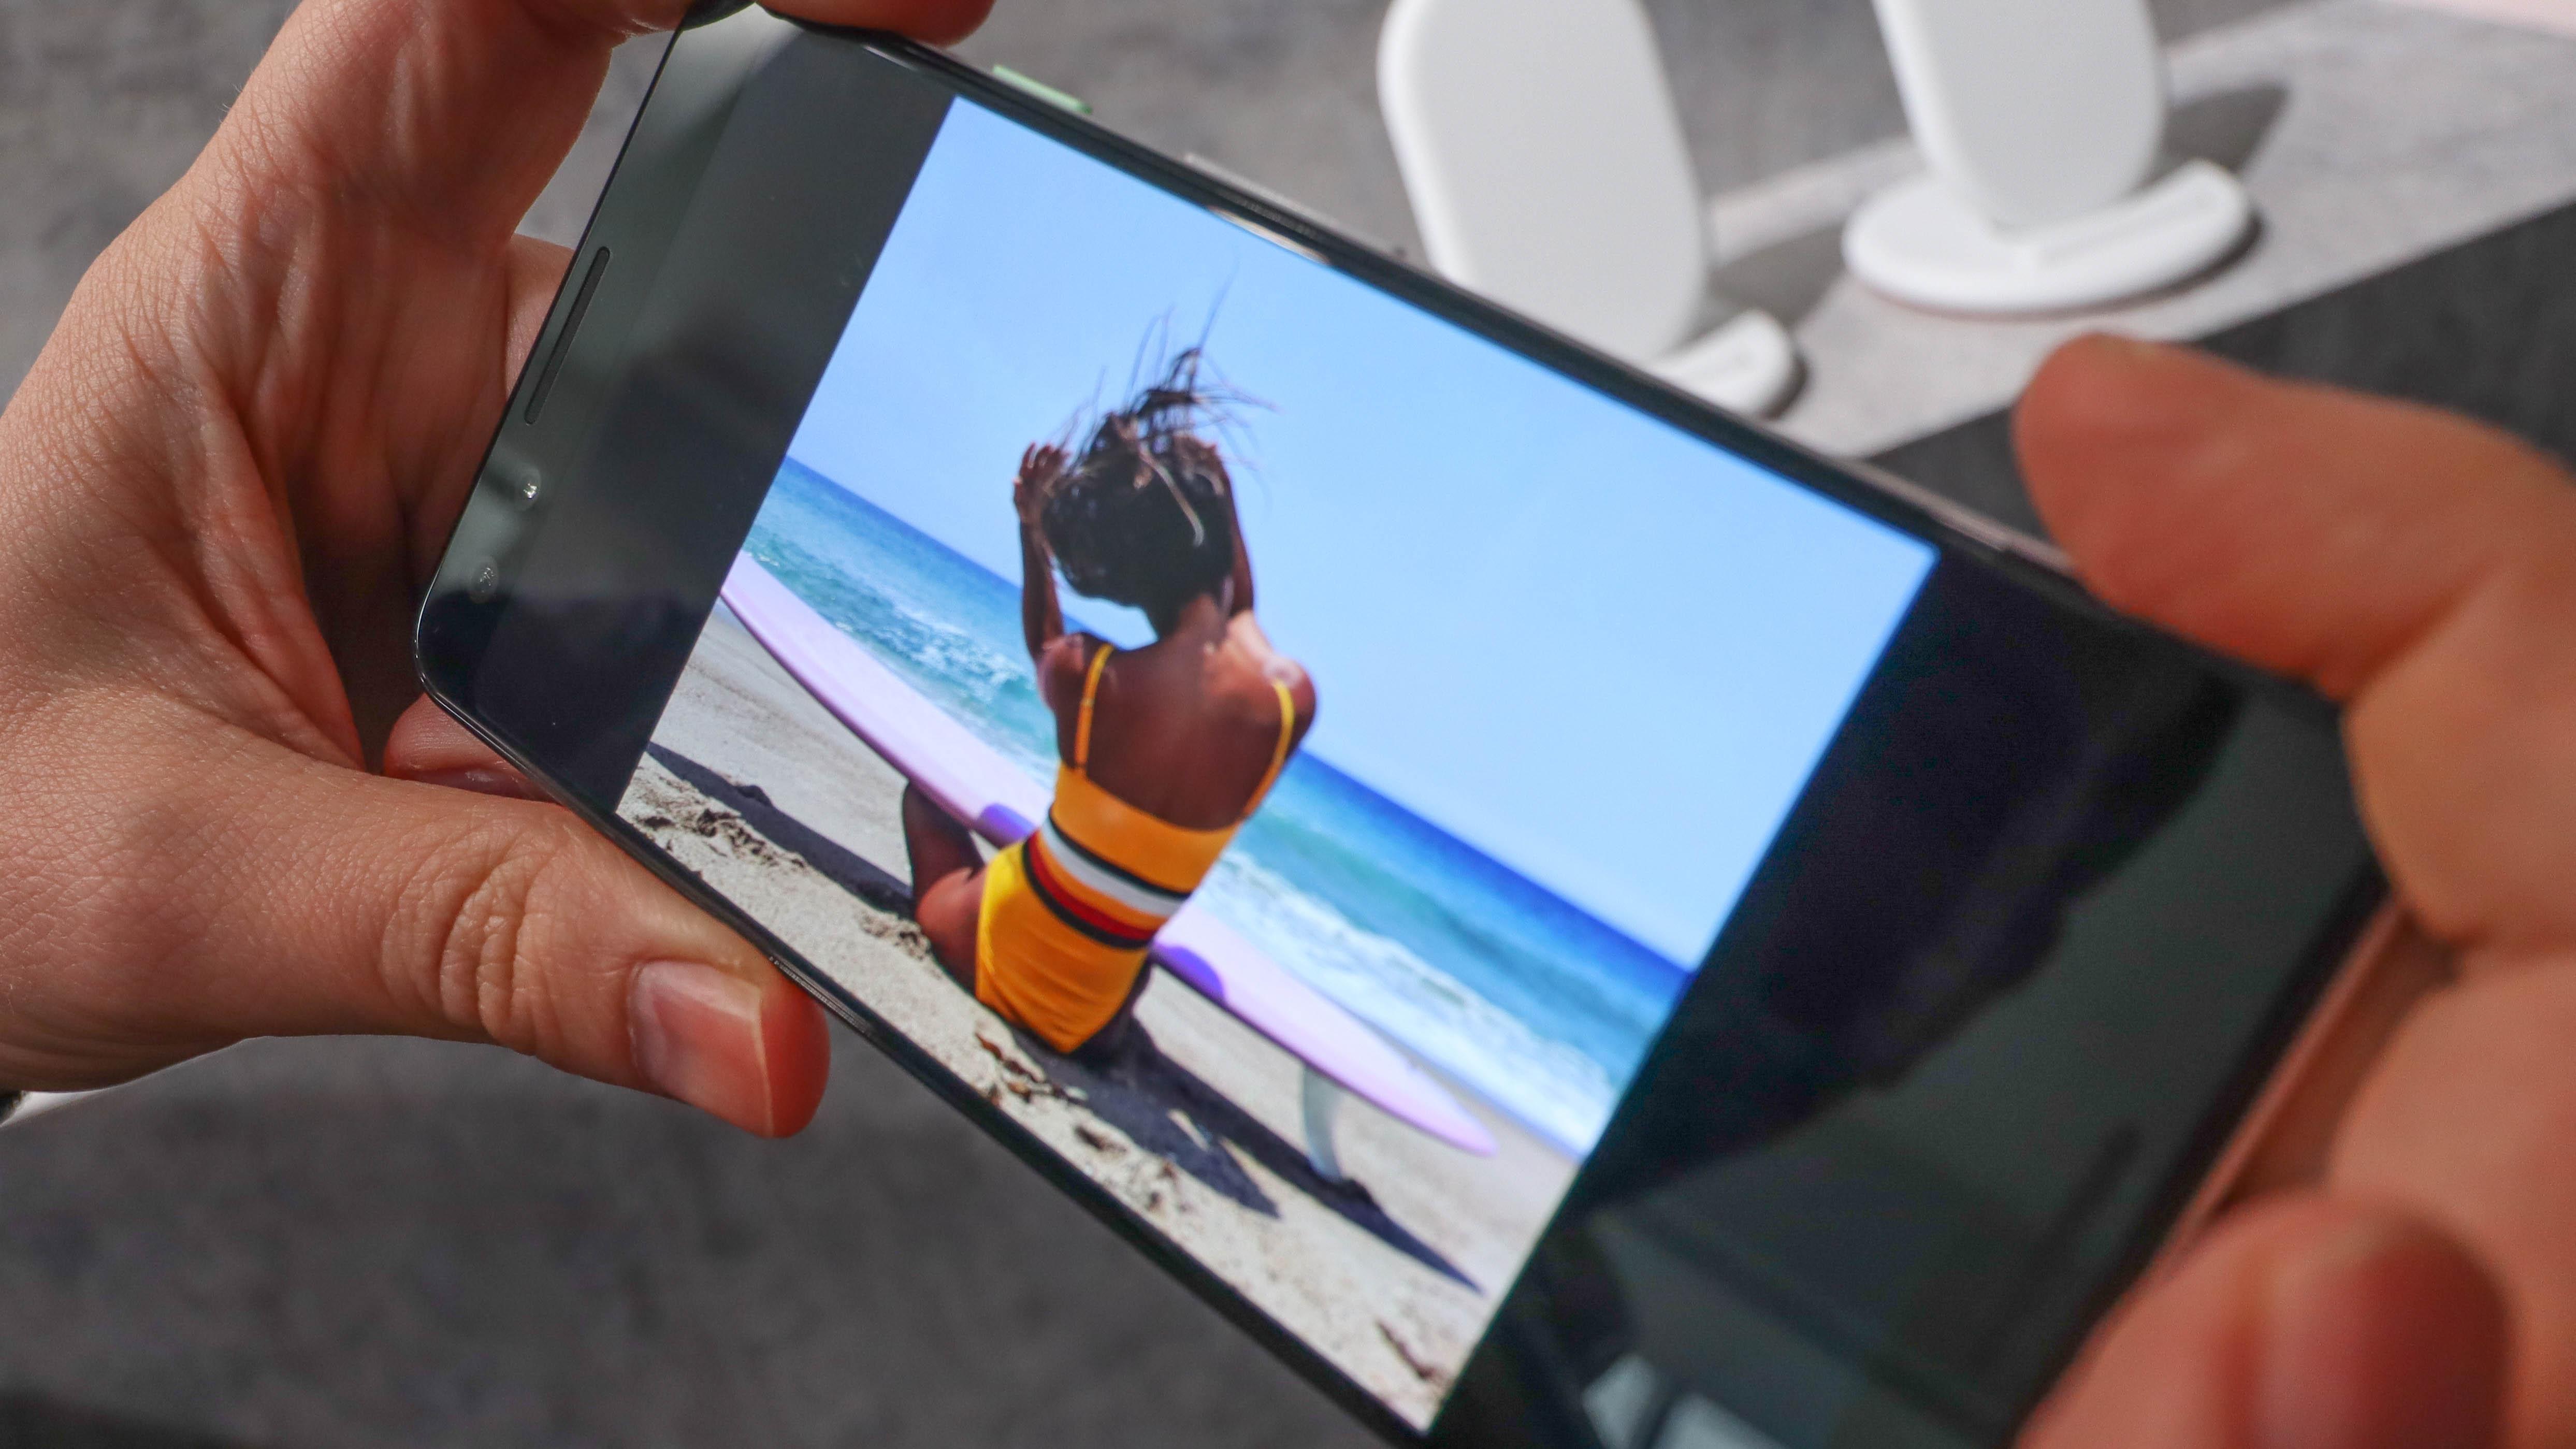 Google Fi customers will get 5G from Sprint's network | TechRadar